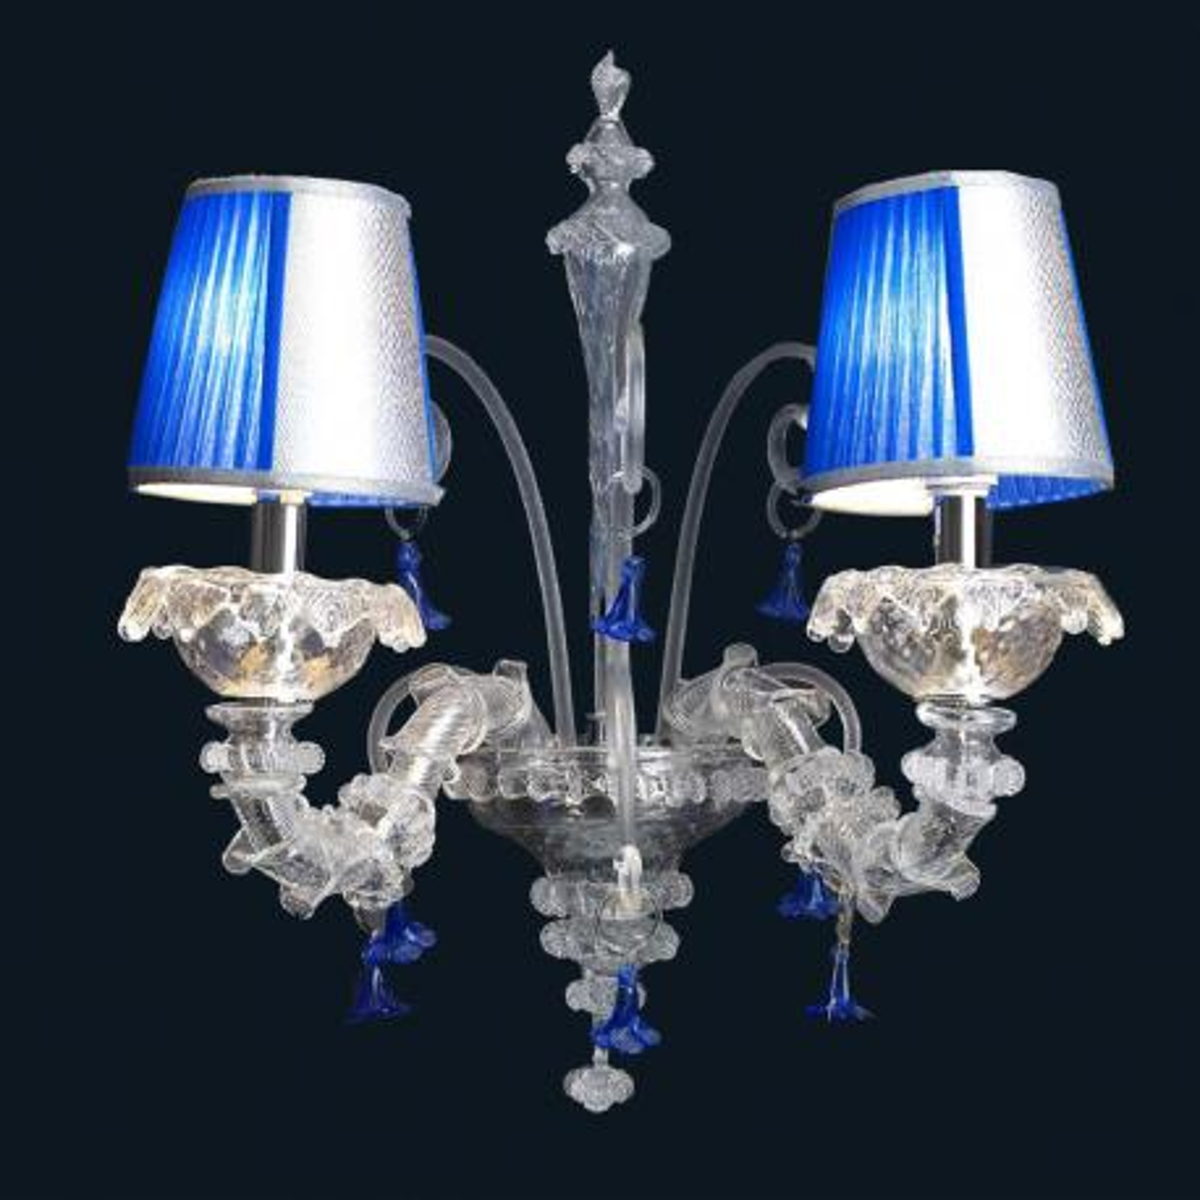 """Julien"" aplique de pared de Murano - 2 luces - transparente y azul"